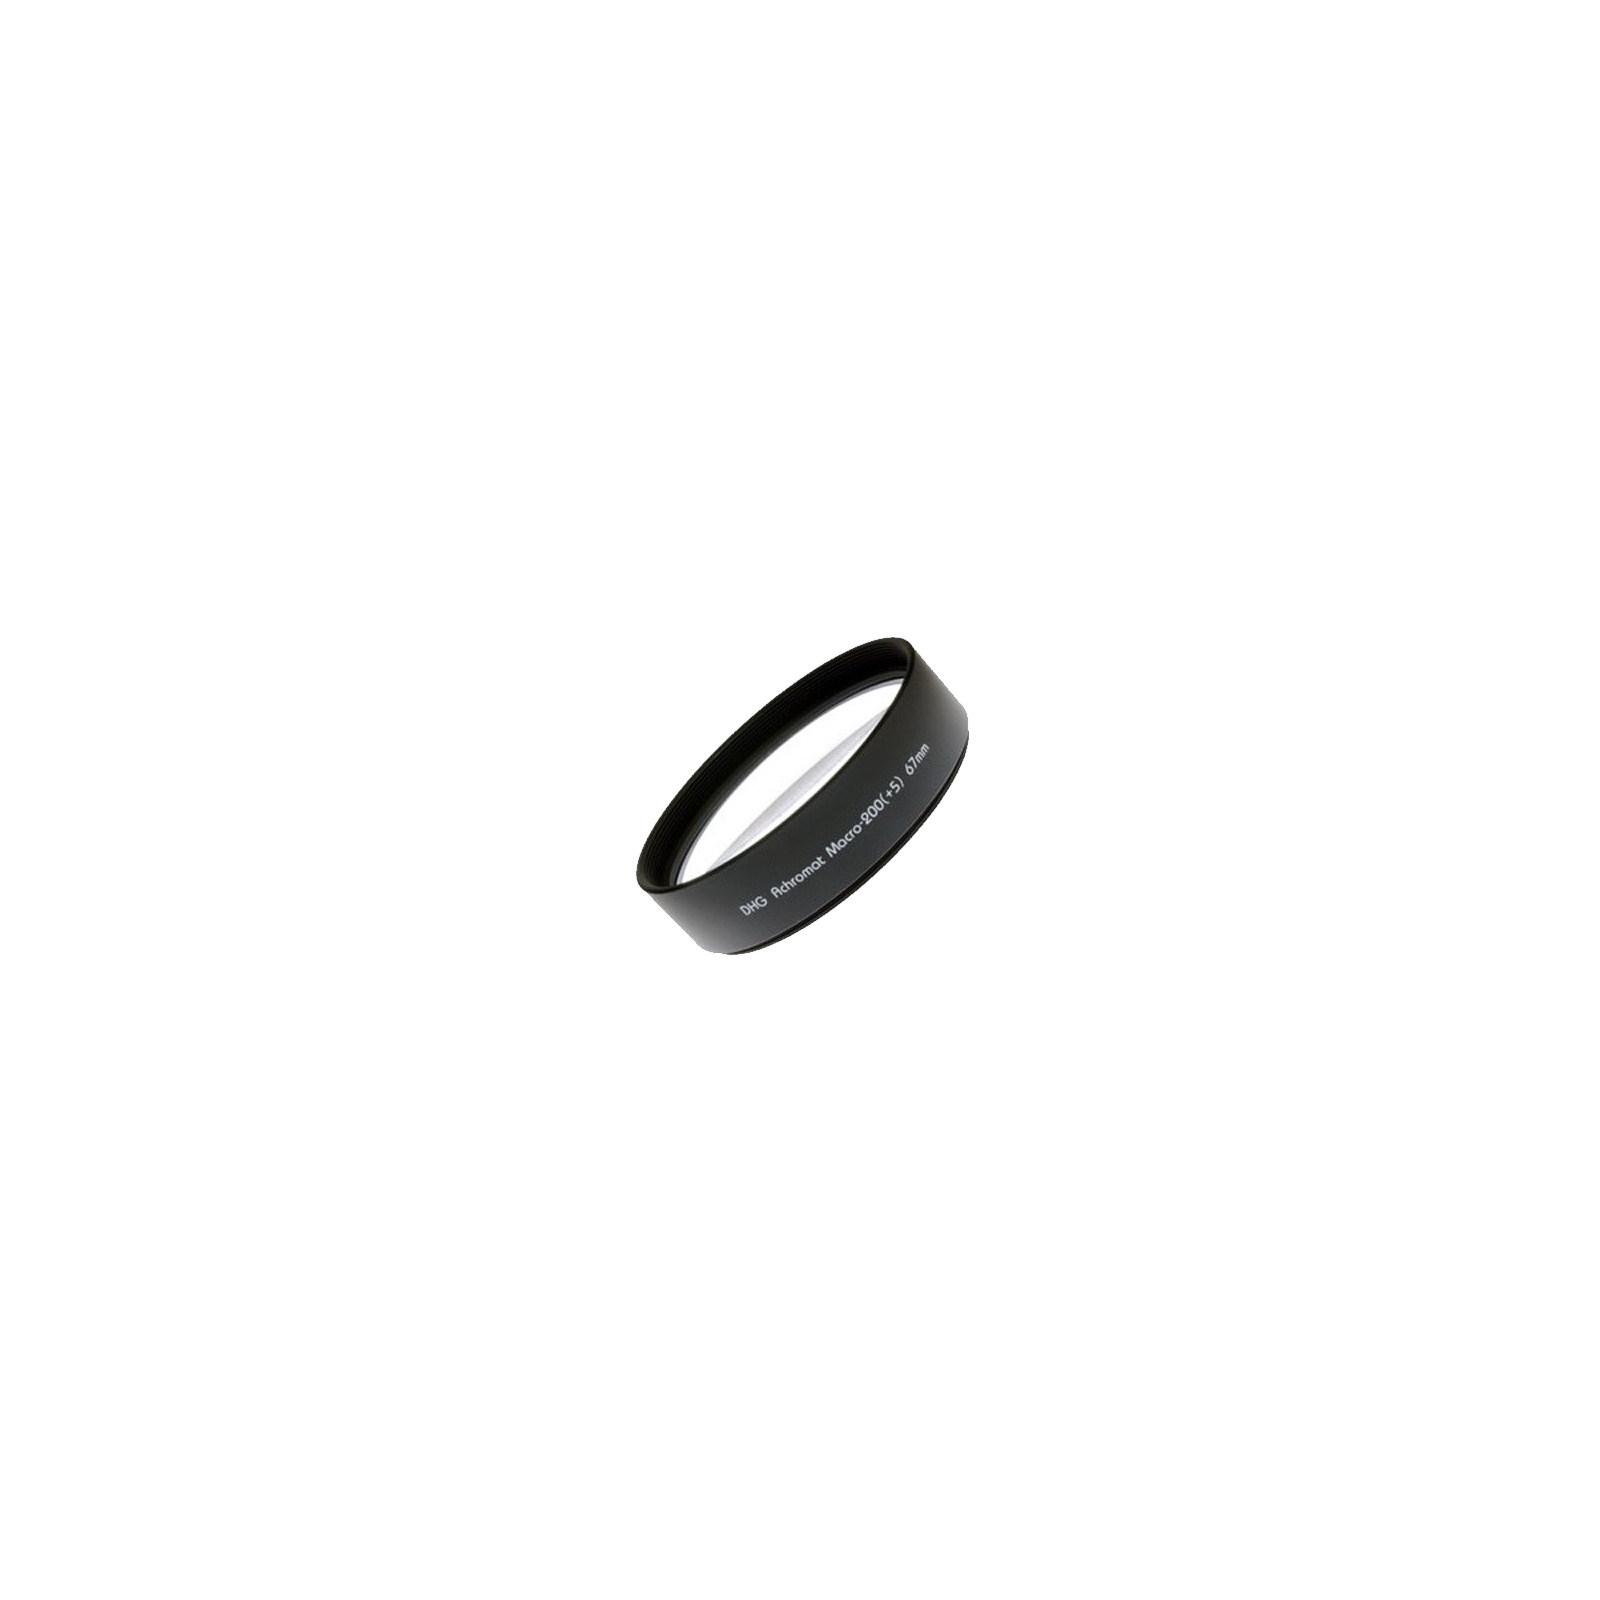 Светофильтр Marumi DHG Achromat Macro-200(+5) 67mm